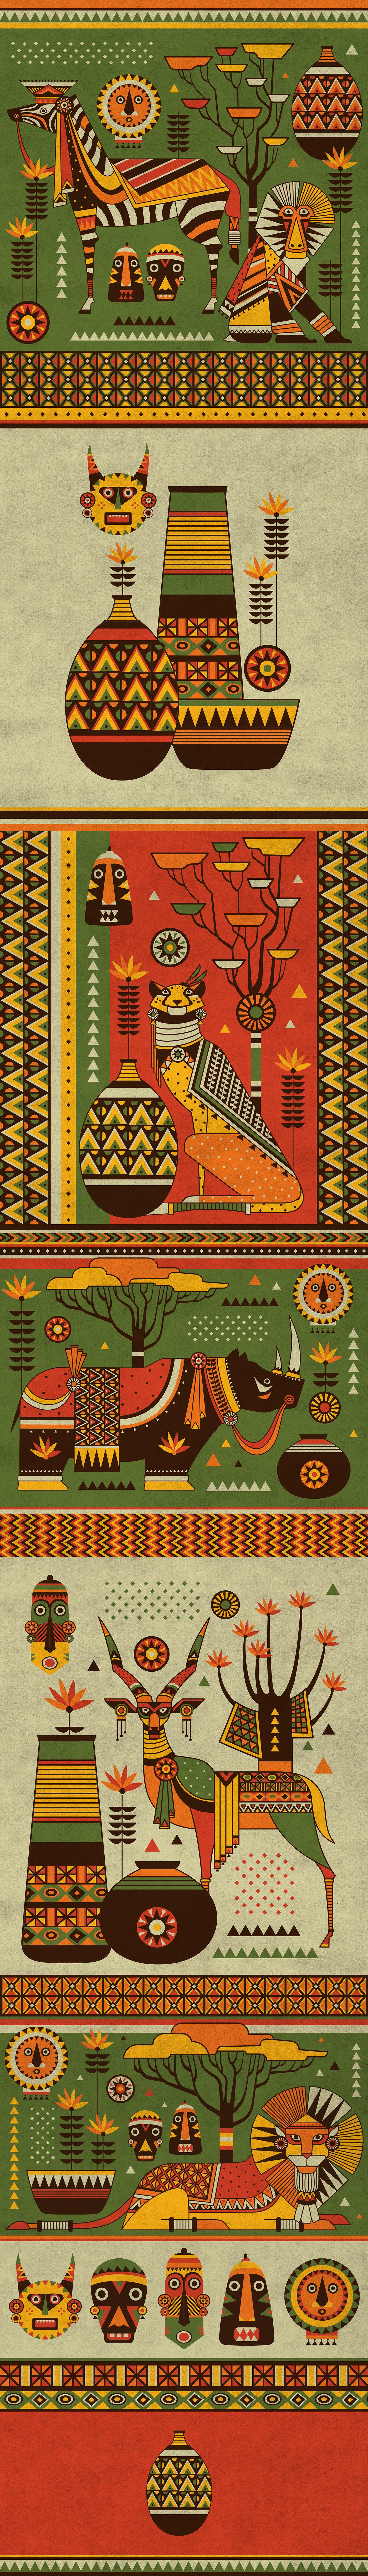 africa Patterns vector African animals african tribes cheetah Rhino zebra antelope mandrill